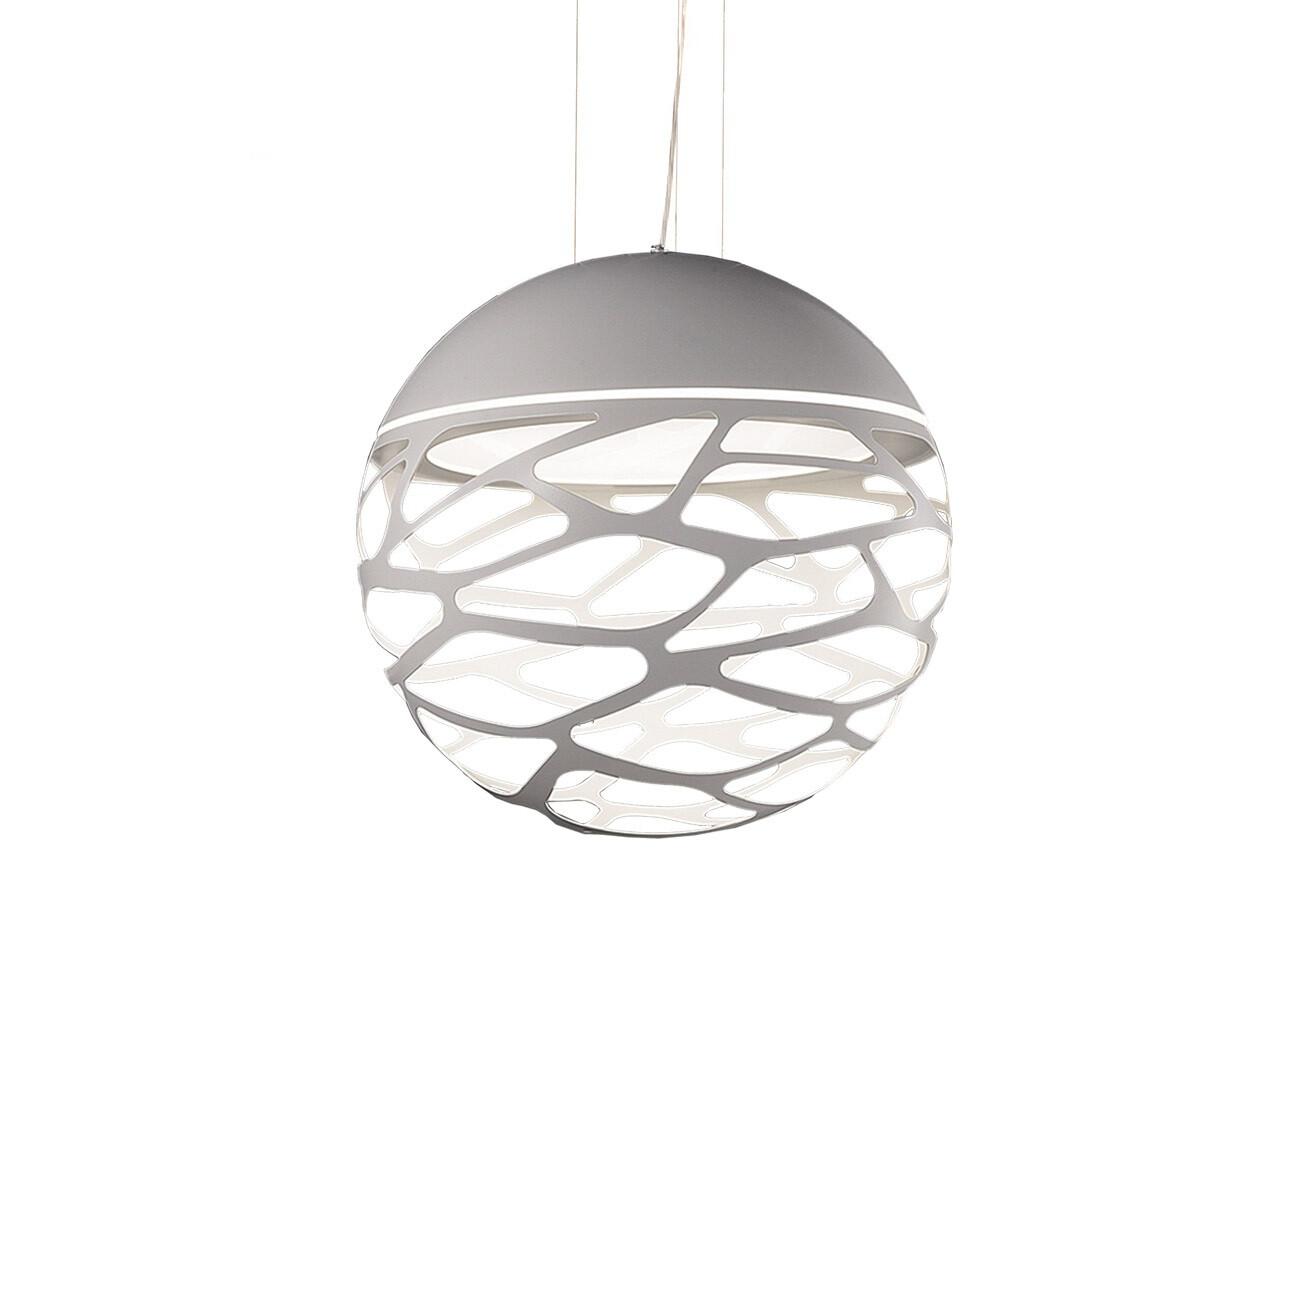 Billede af Kelly SO2 Small Sphere Pendel Hvid - Studio Italia Design